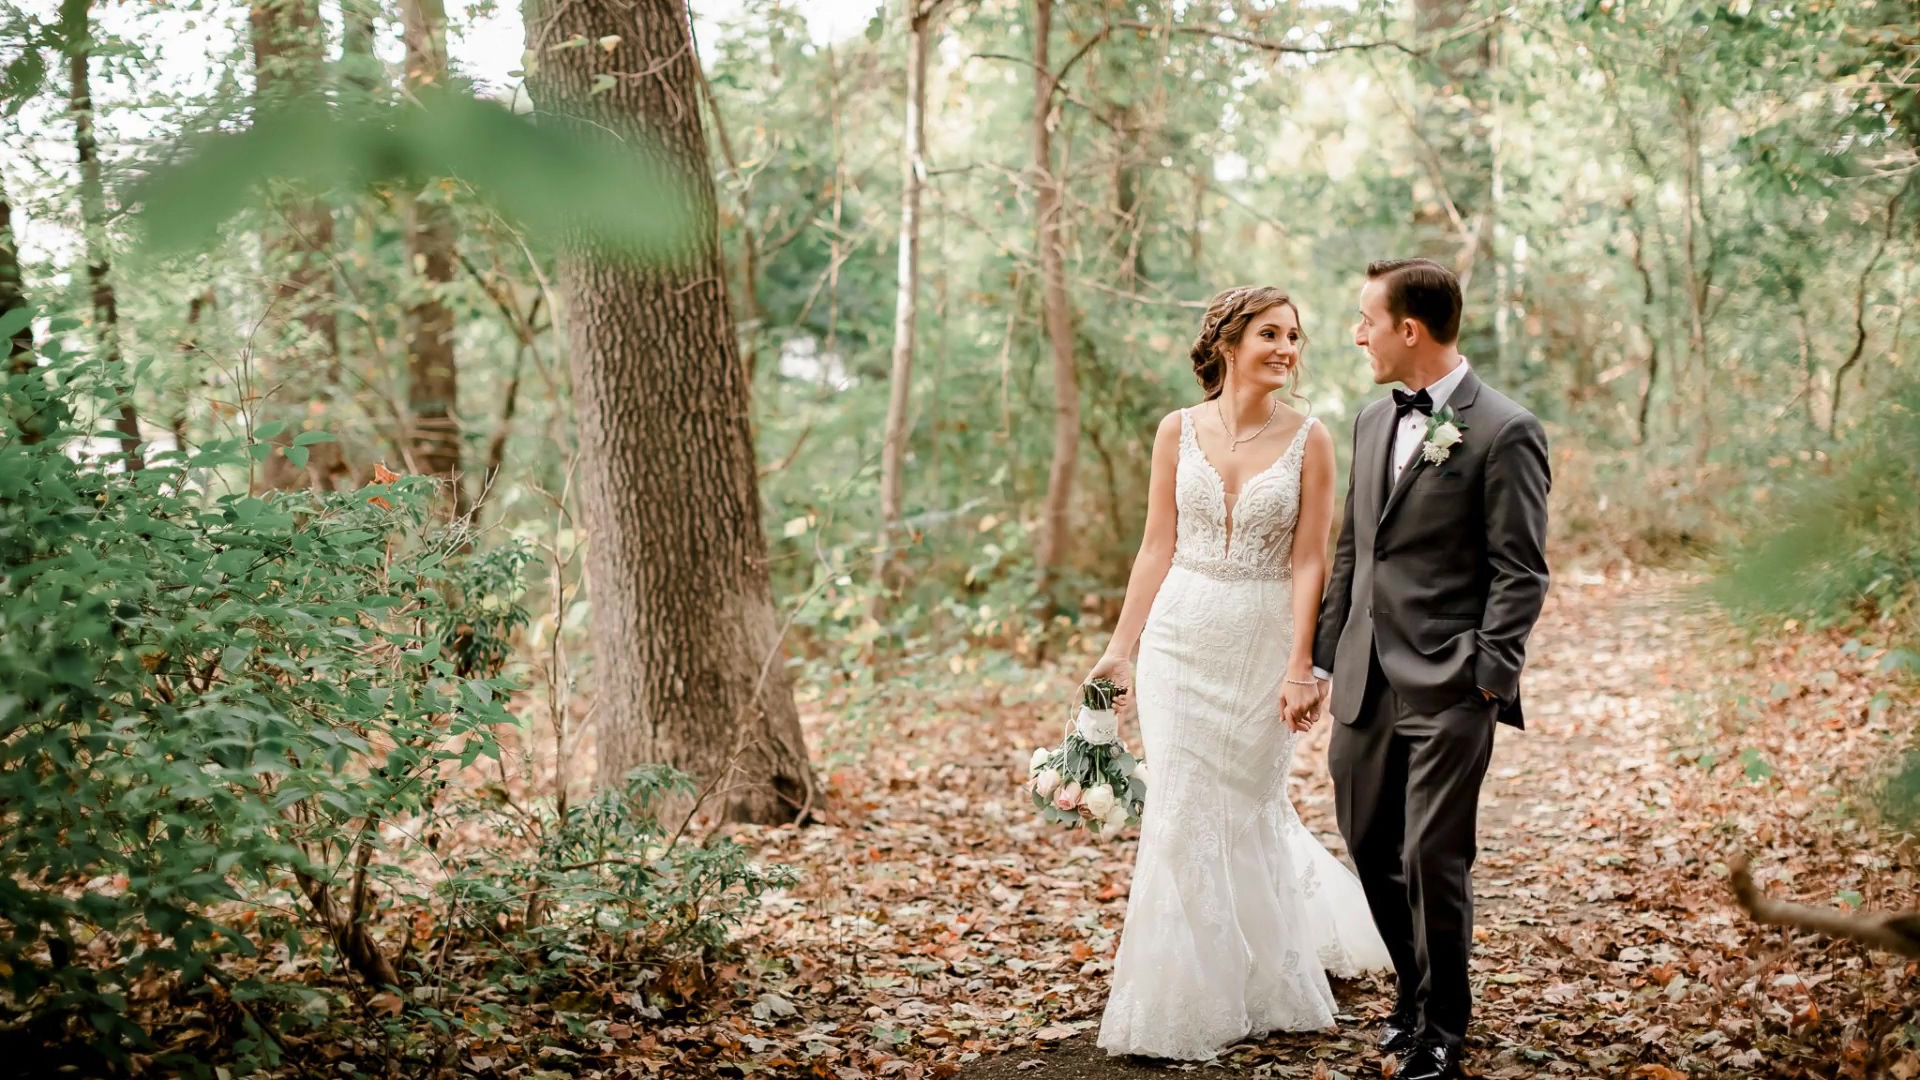 2020_Wedding_Photos_at_Syosset_Woodbury_Park_1080p